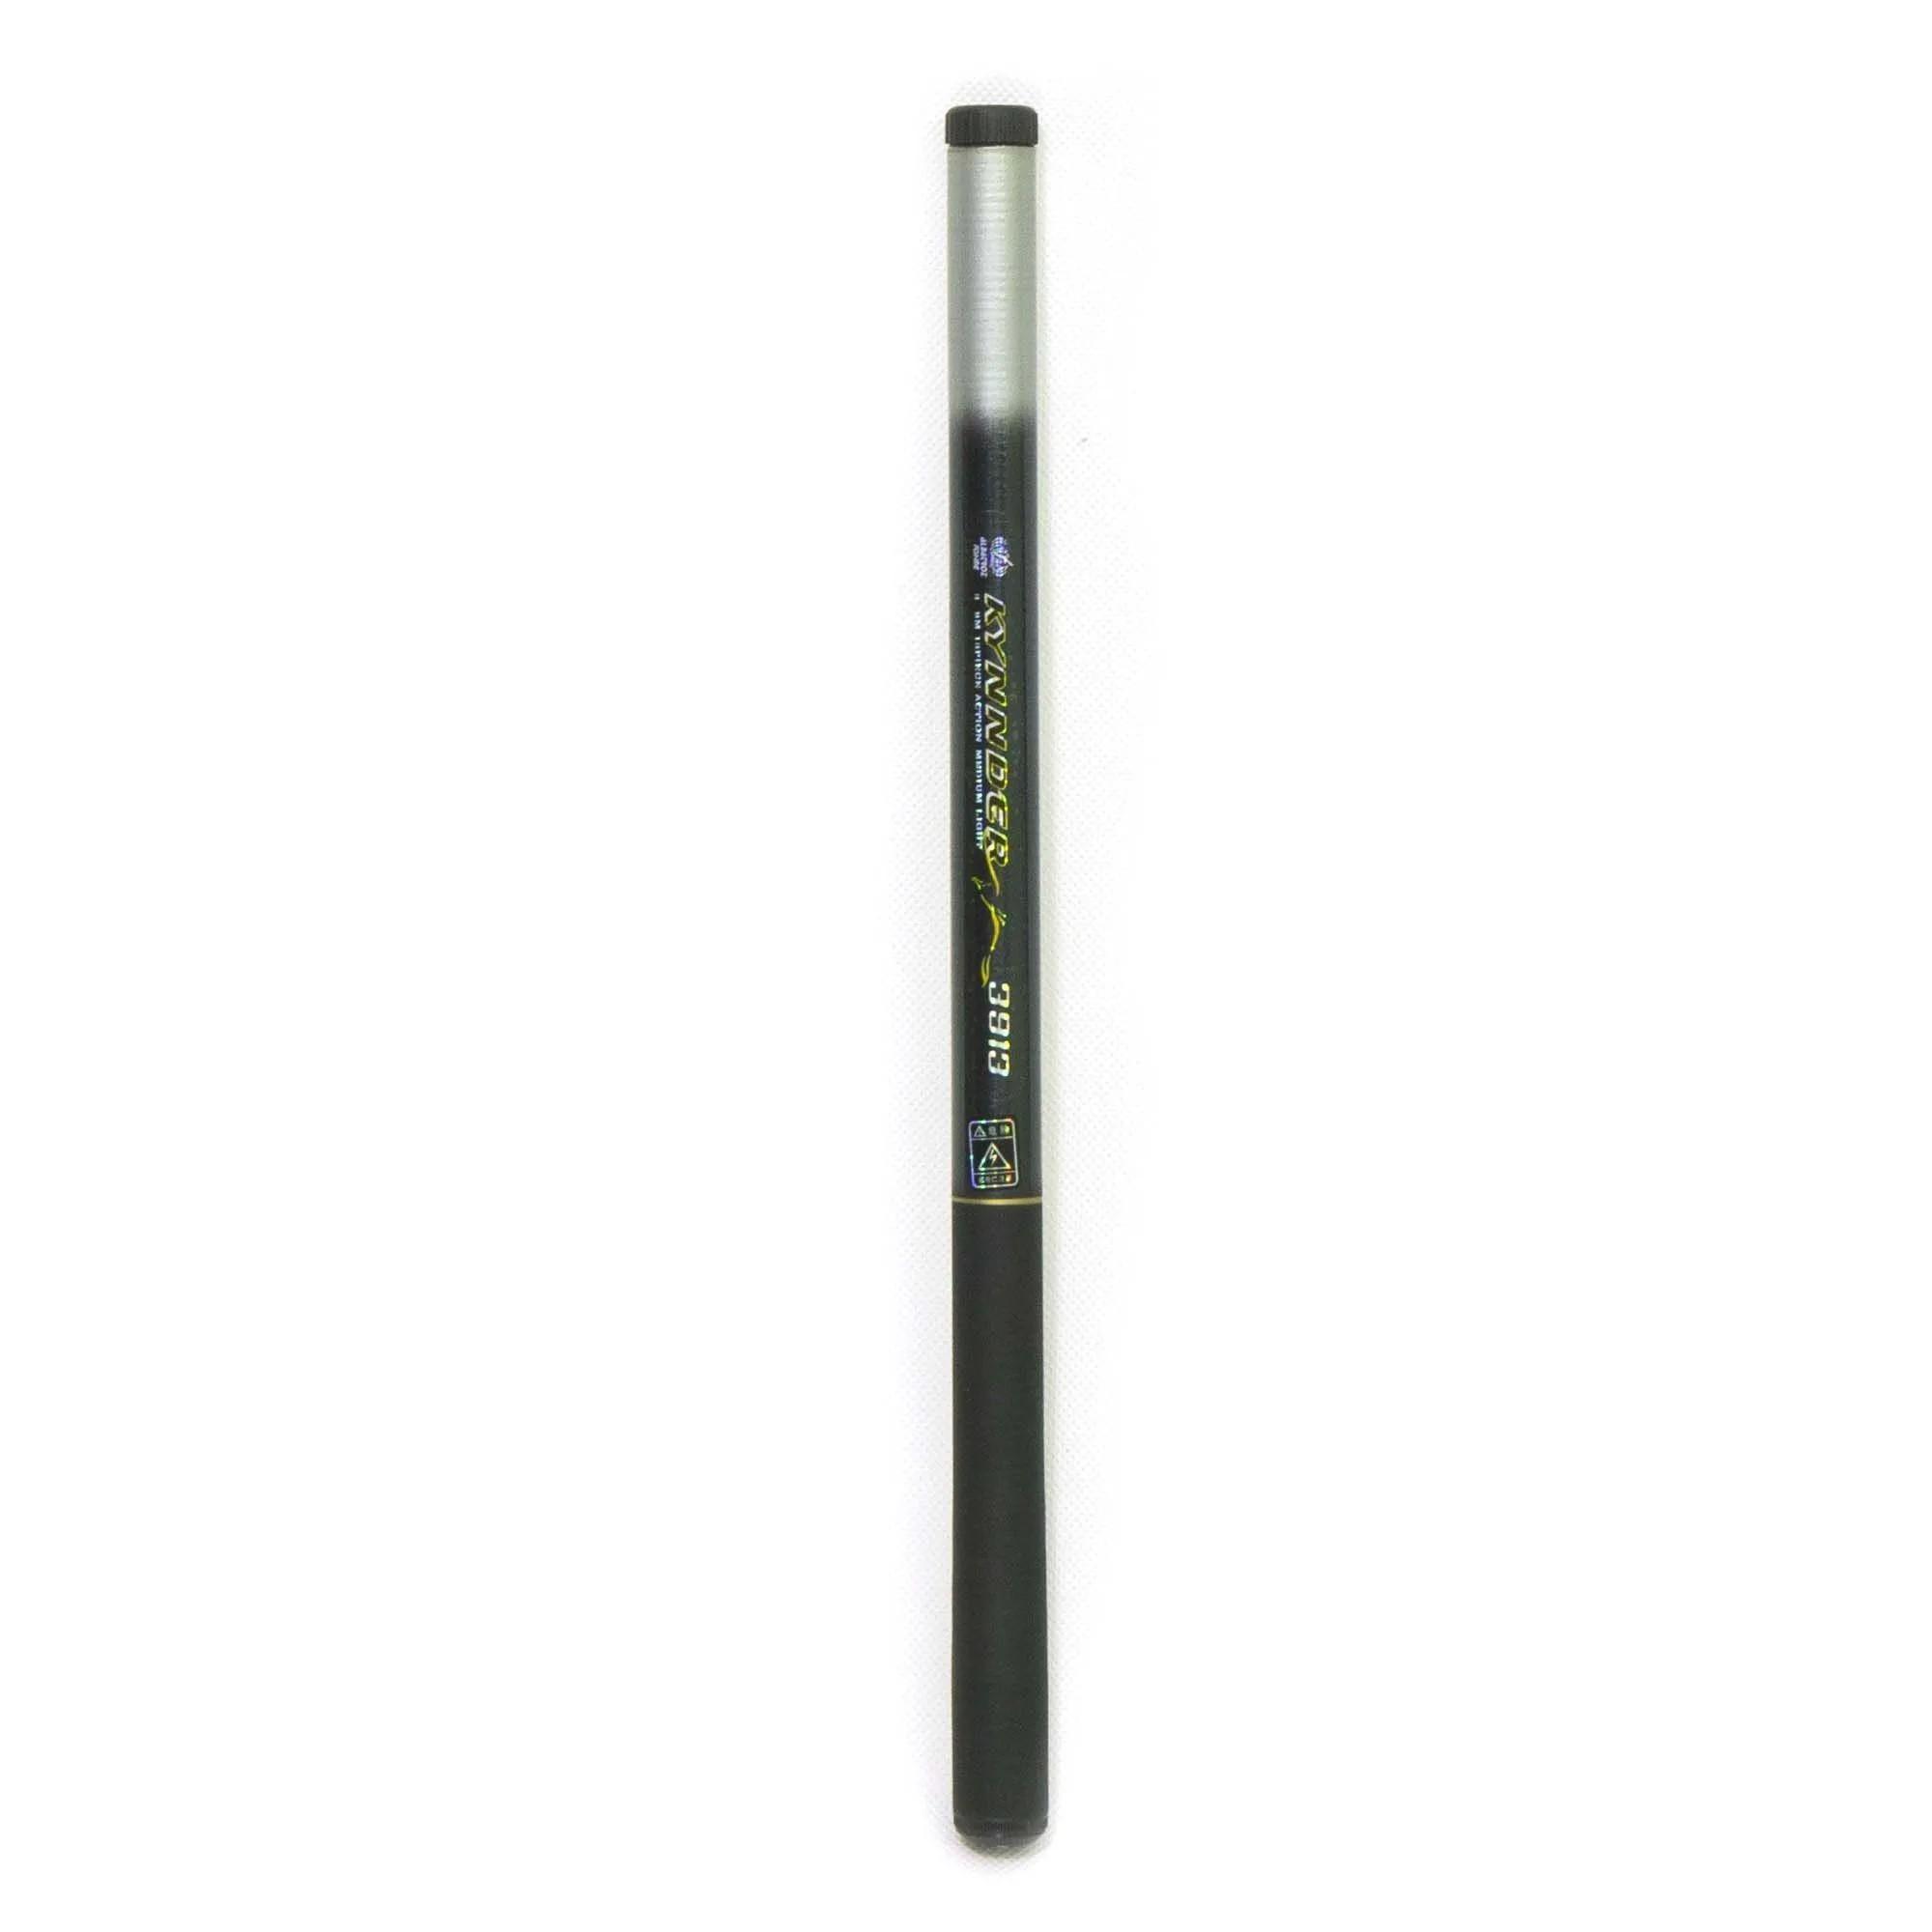 Vara Telescópica uso sem Molinete Kynnder 45% Carbono 2,40m - 8P  - Artpesca